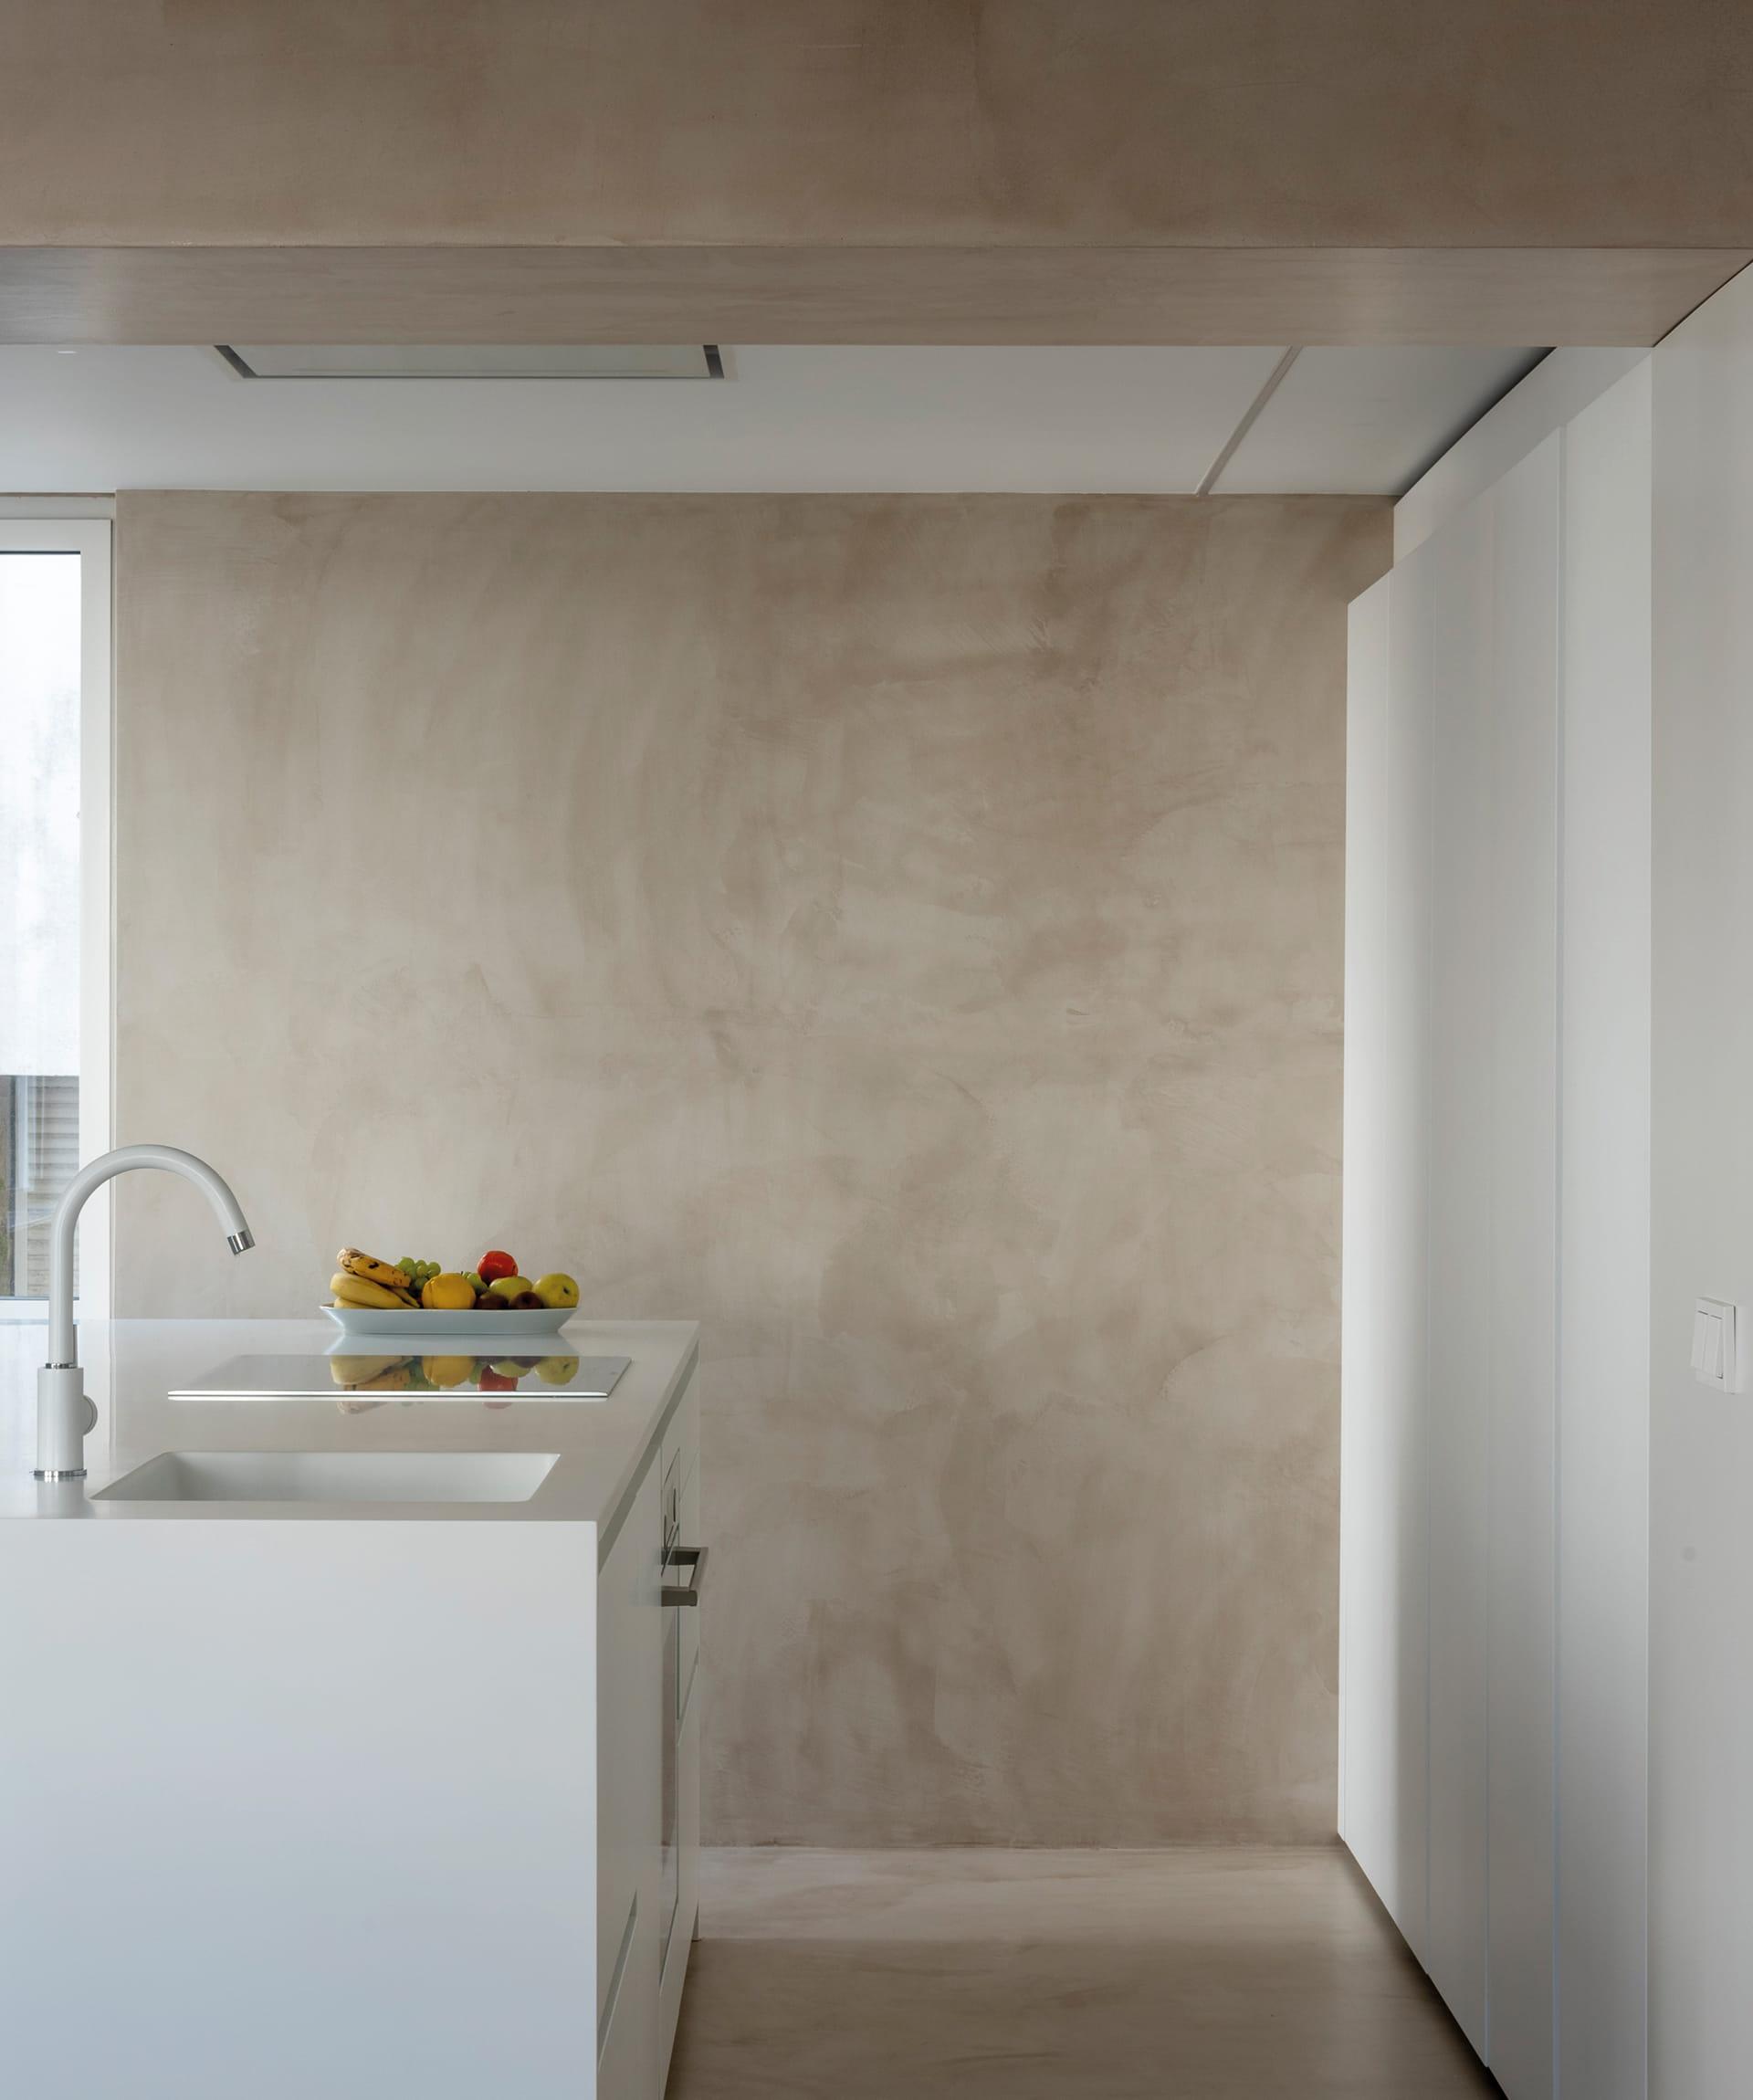 Keuken met in wit werkblad geïntegreerde spoelbak